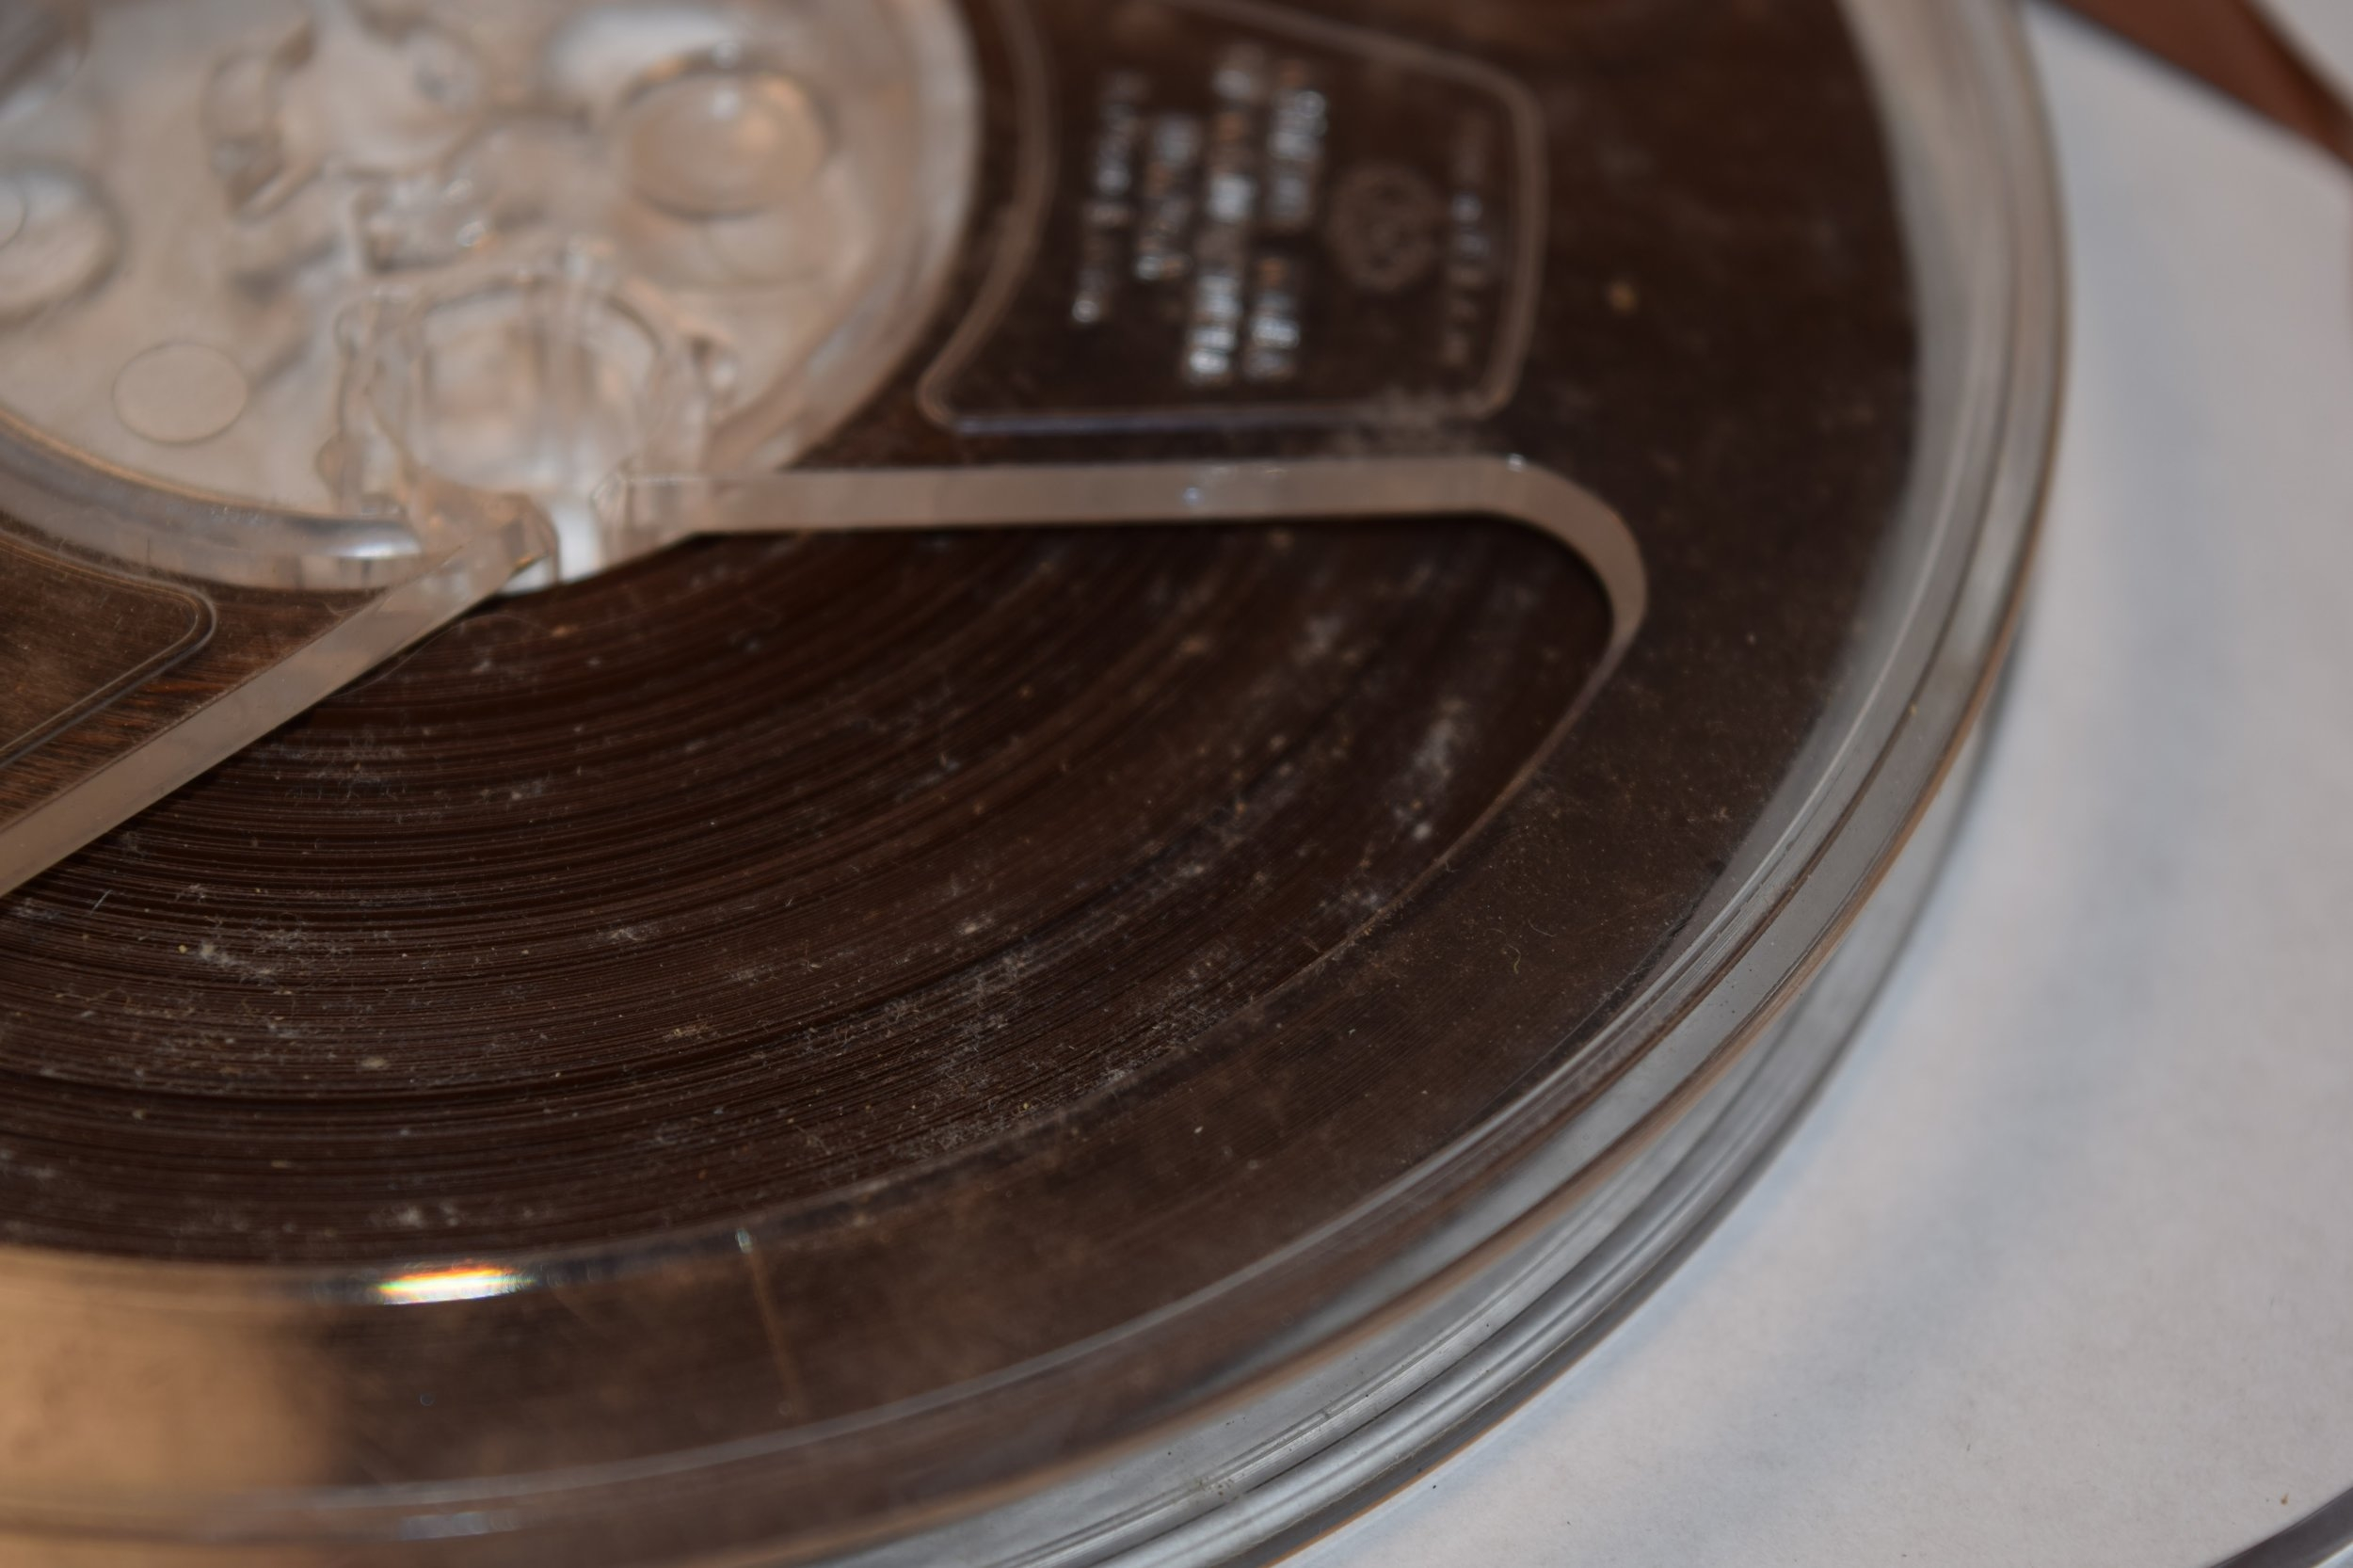 Mold growth on 1/4 inch open reel audiotape